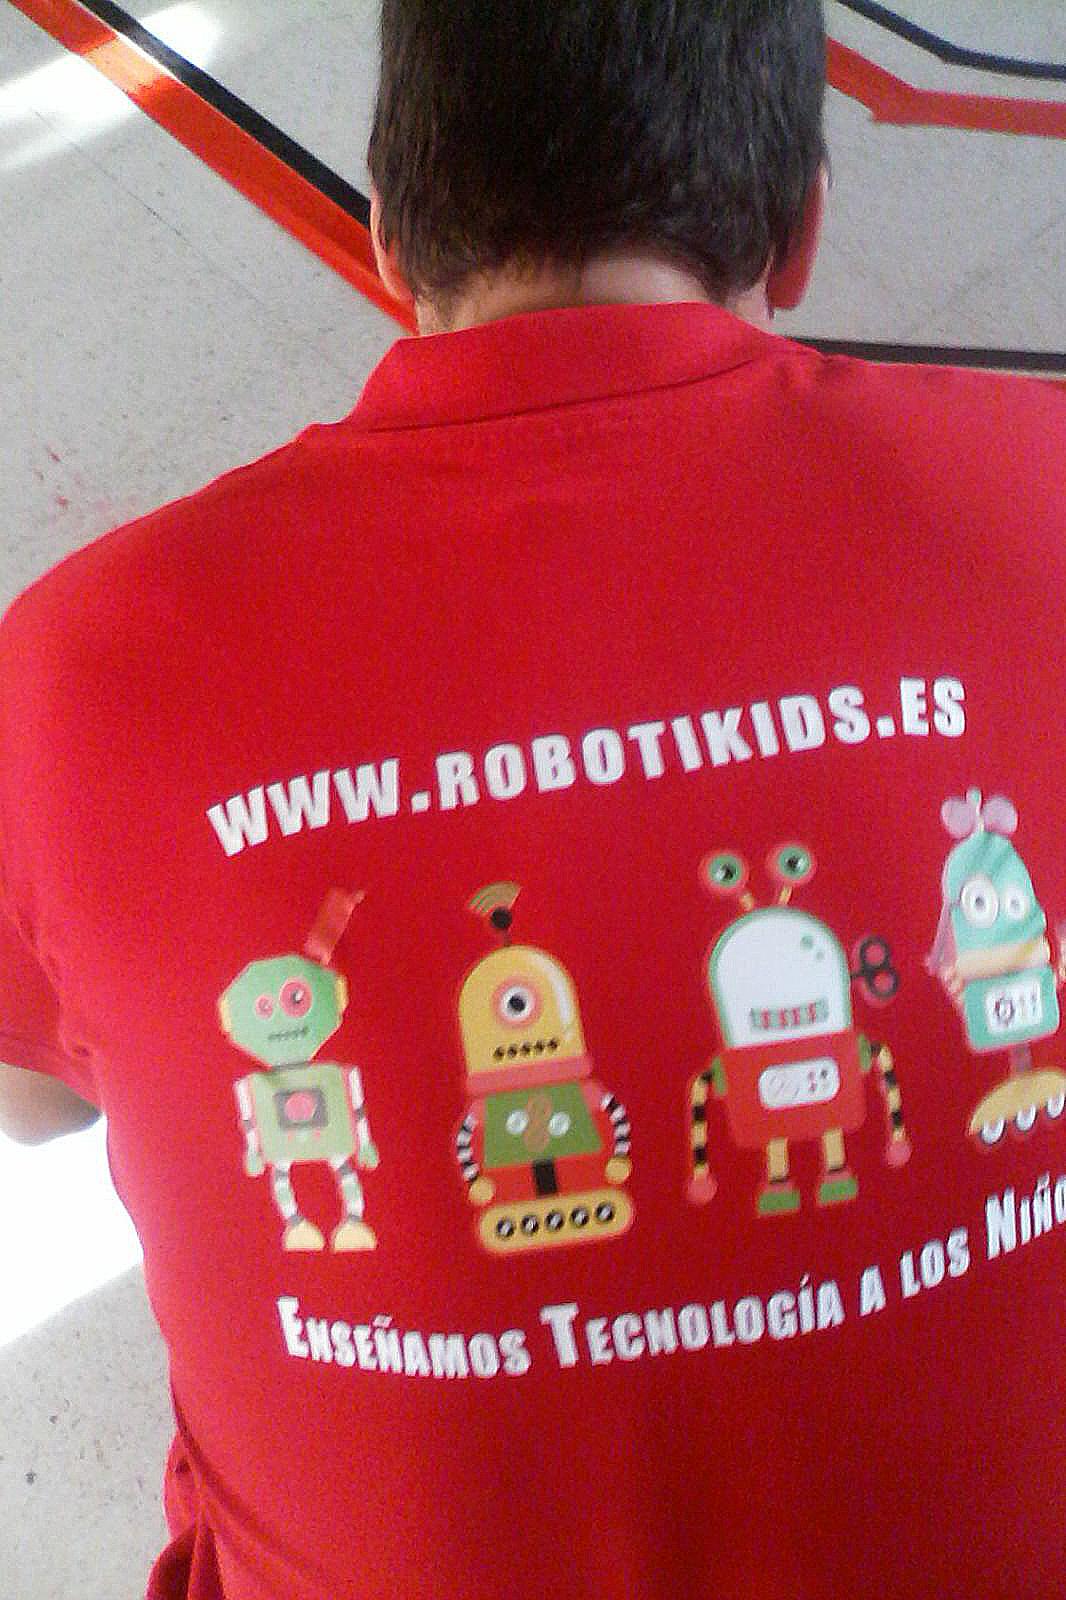 Robotikids